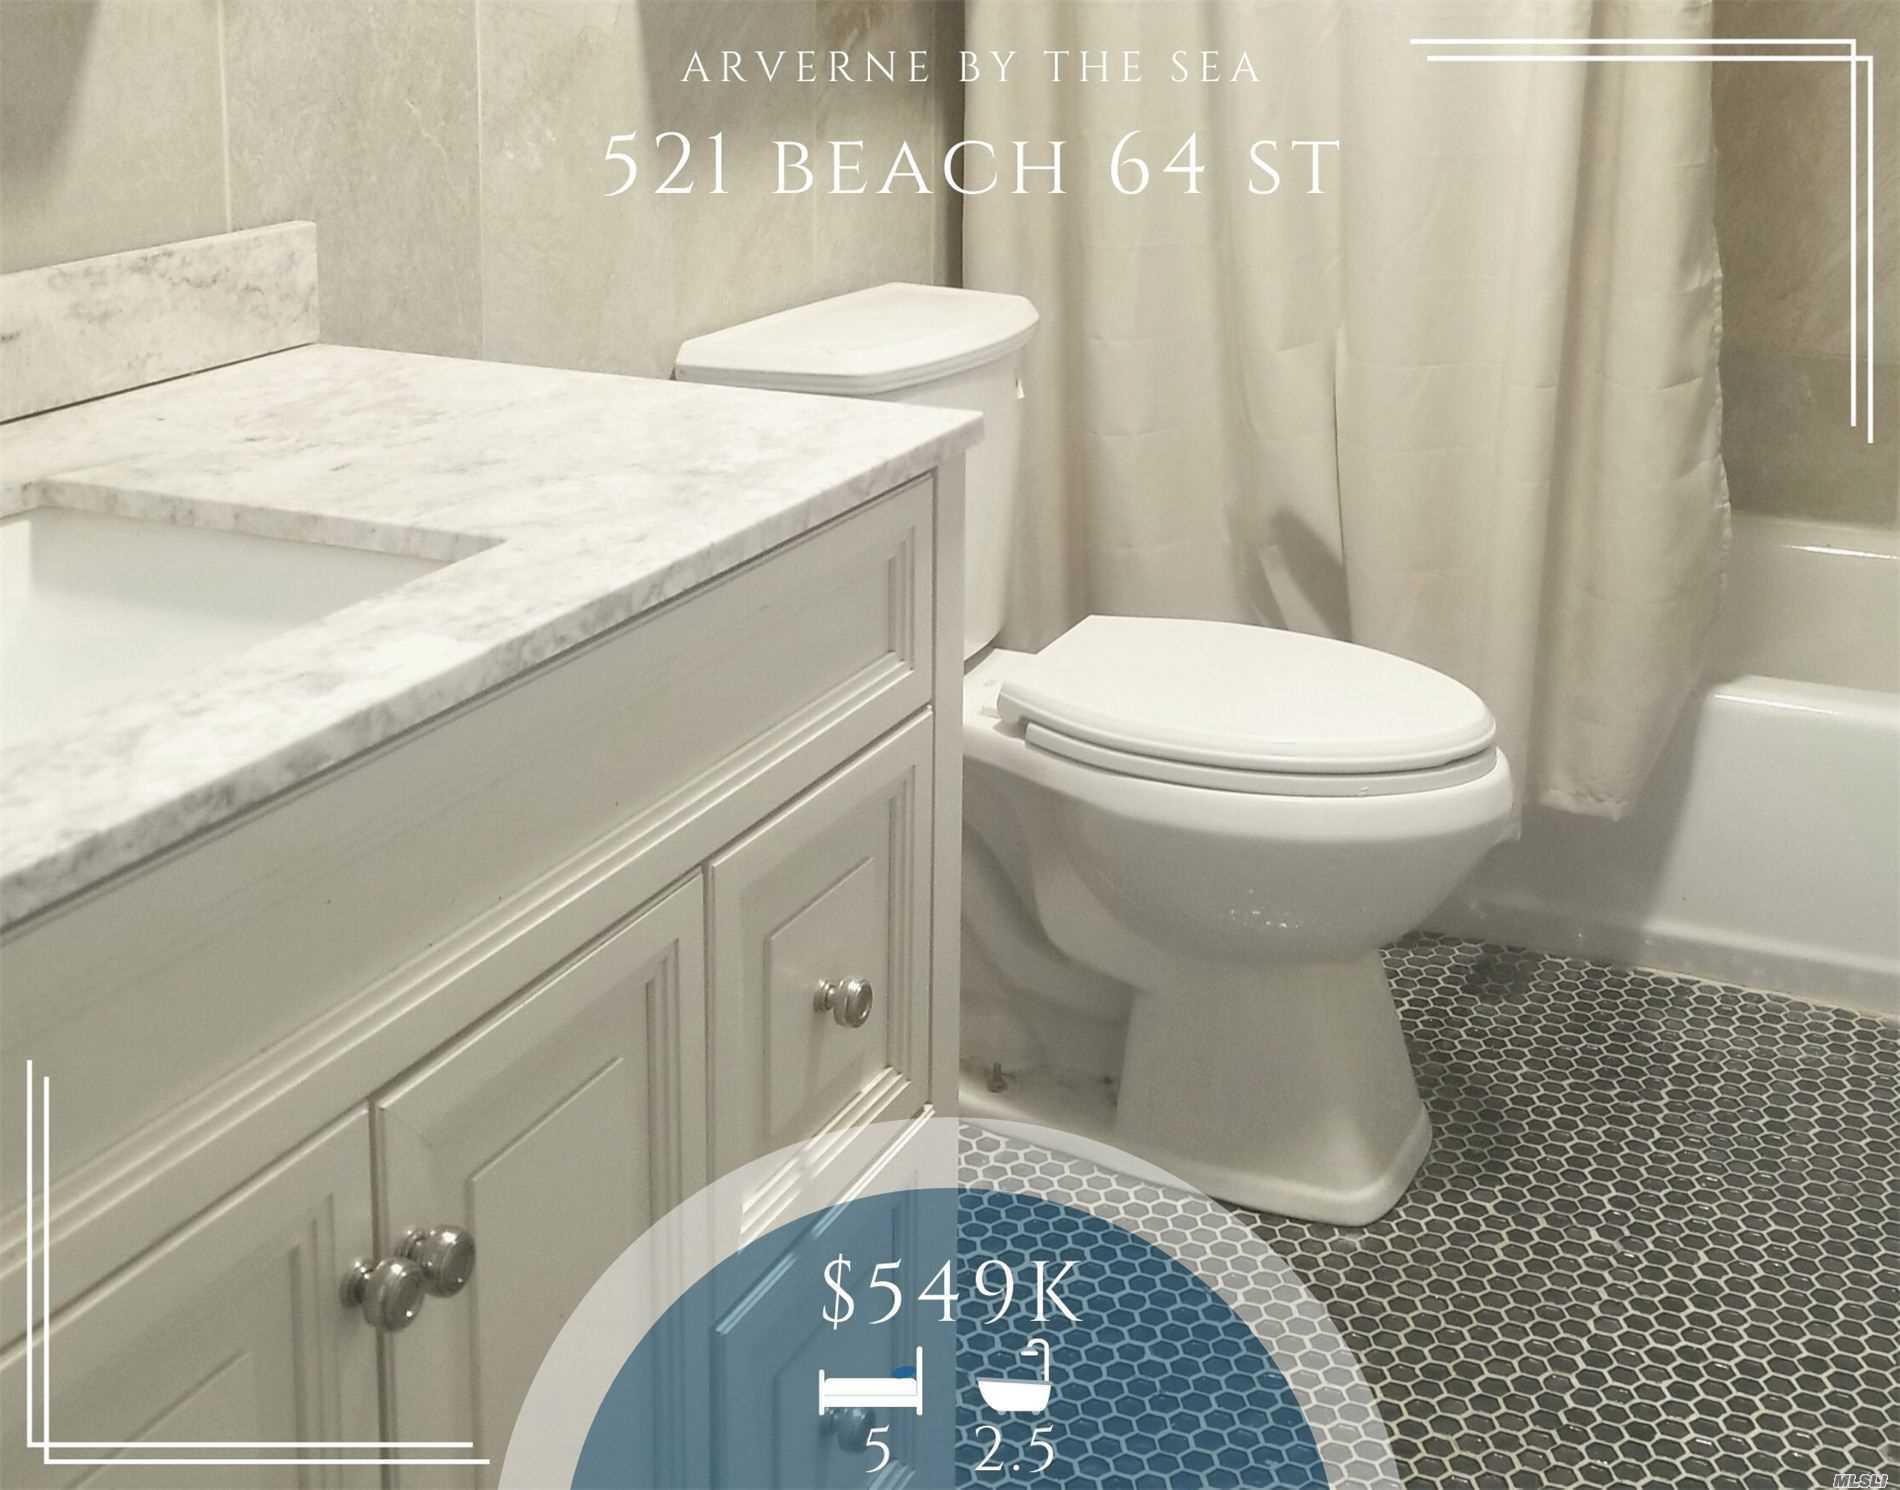 Property for sale at 521 Beach 64th Street, Arverne NY 11692, Arverne,  New York 11692